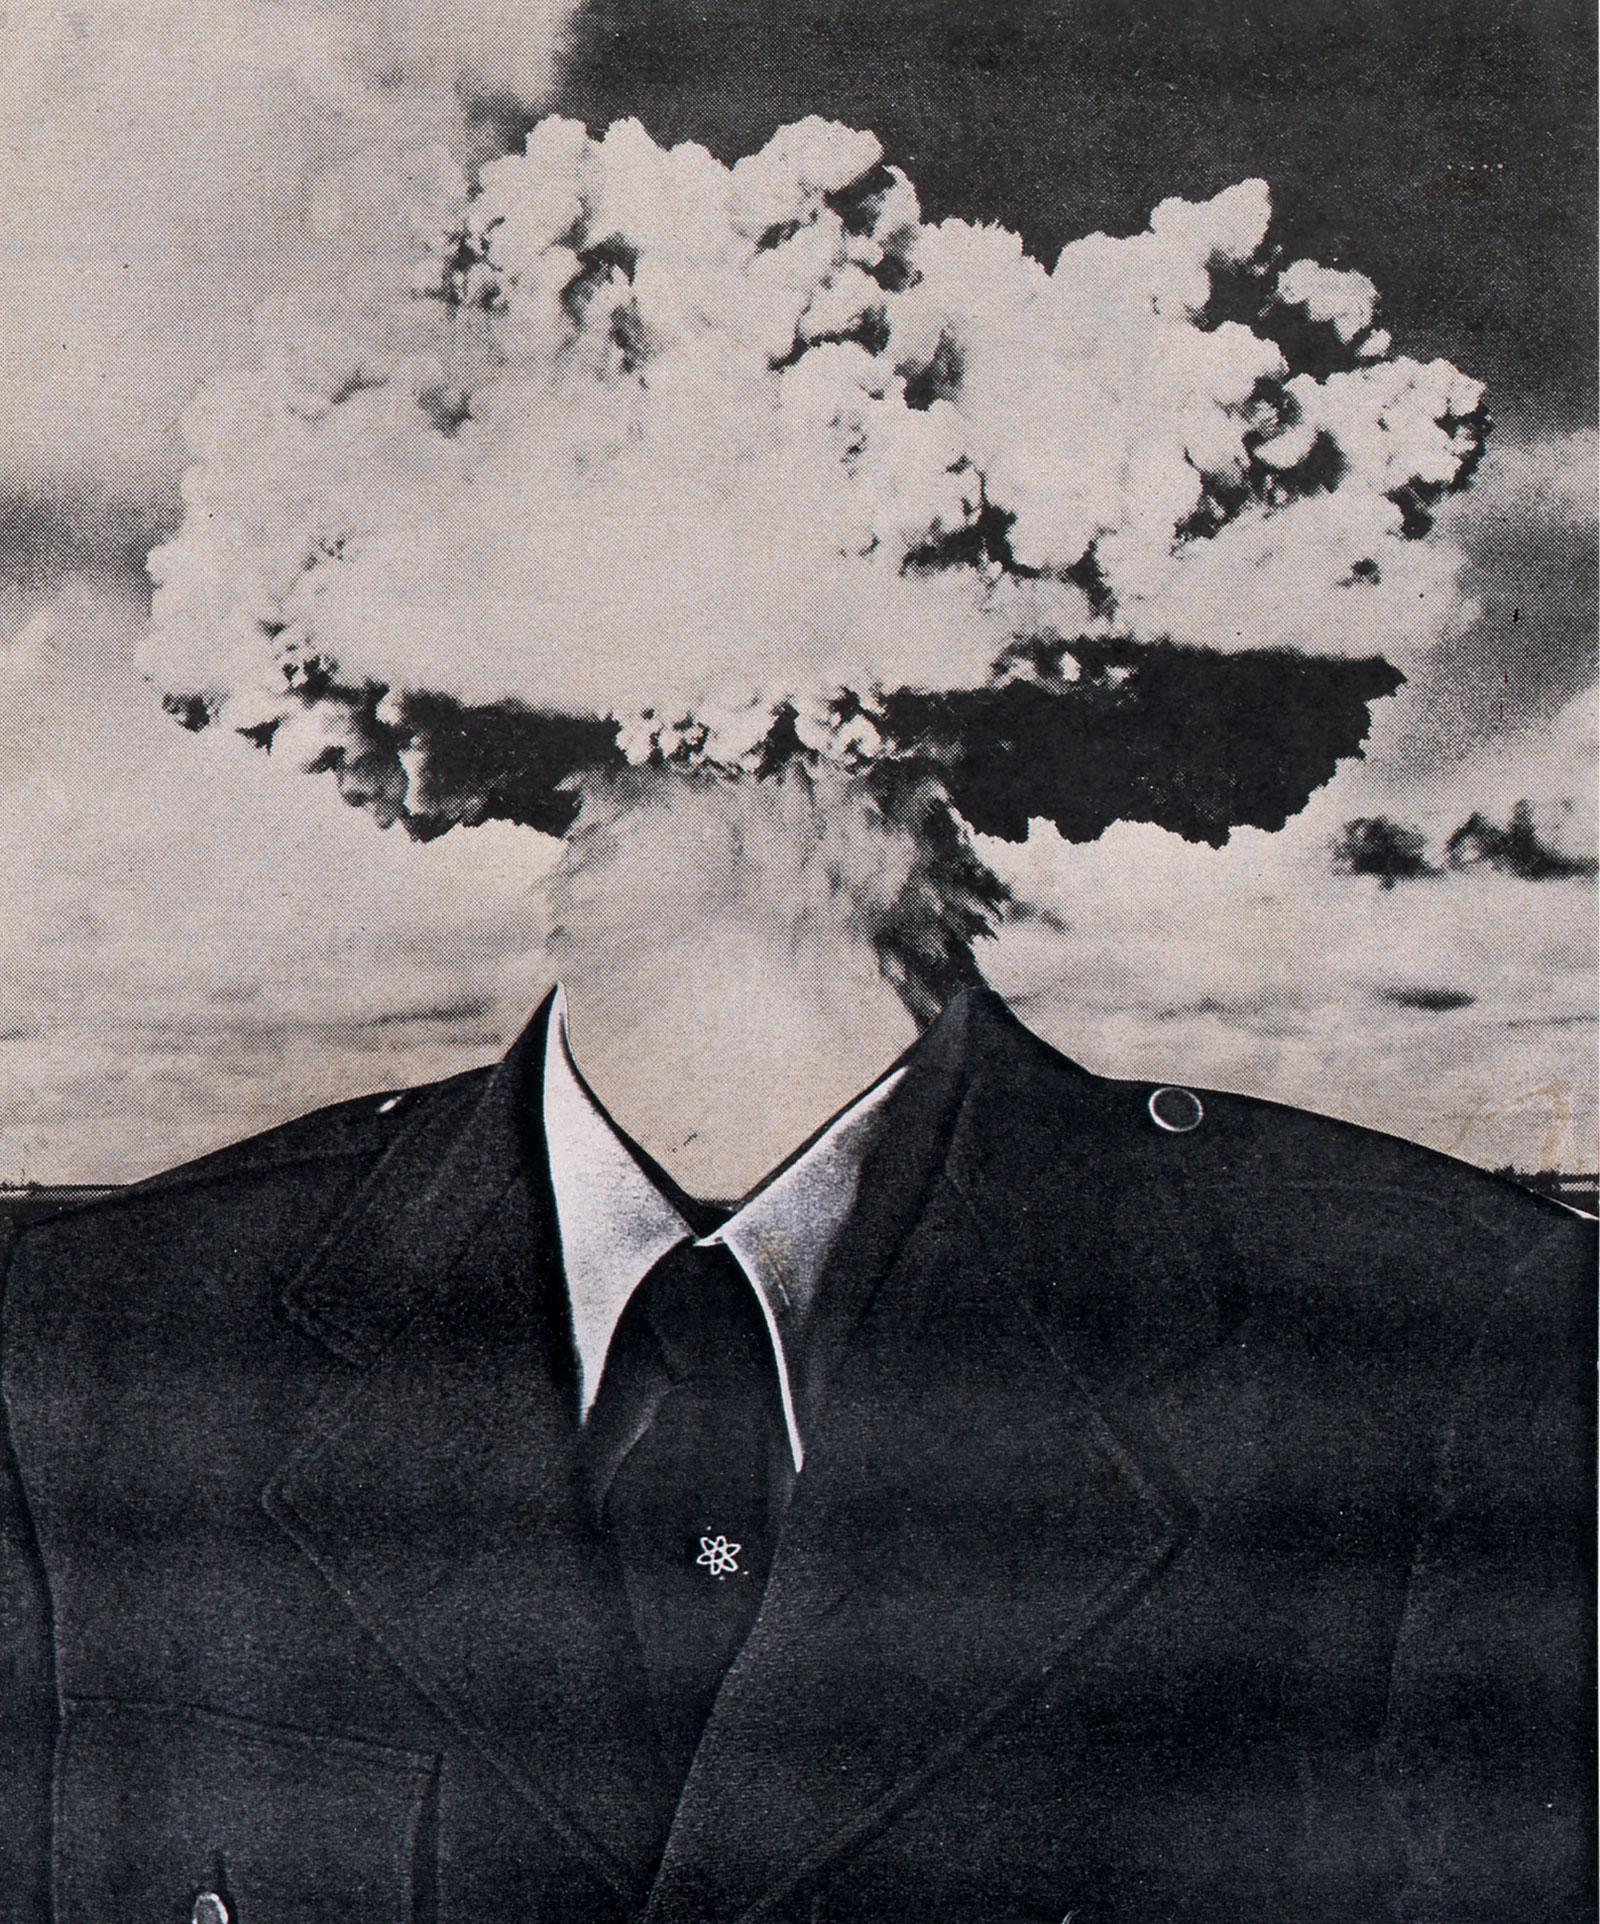 Bruce Conner: Bombhead, 1989